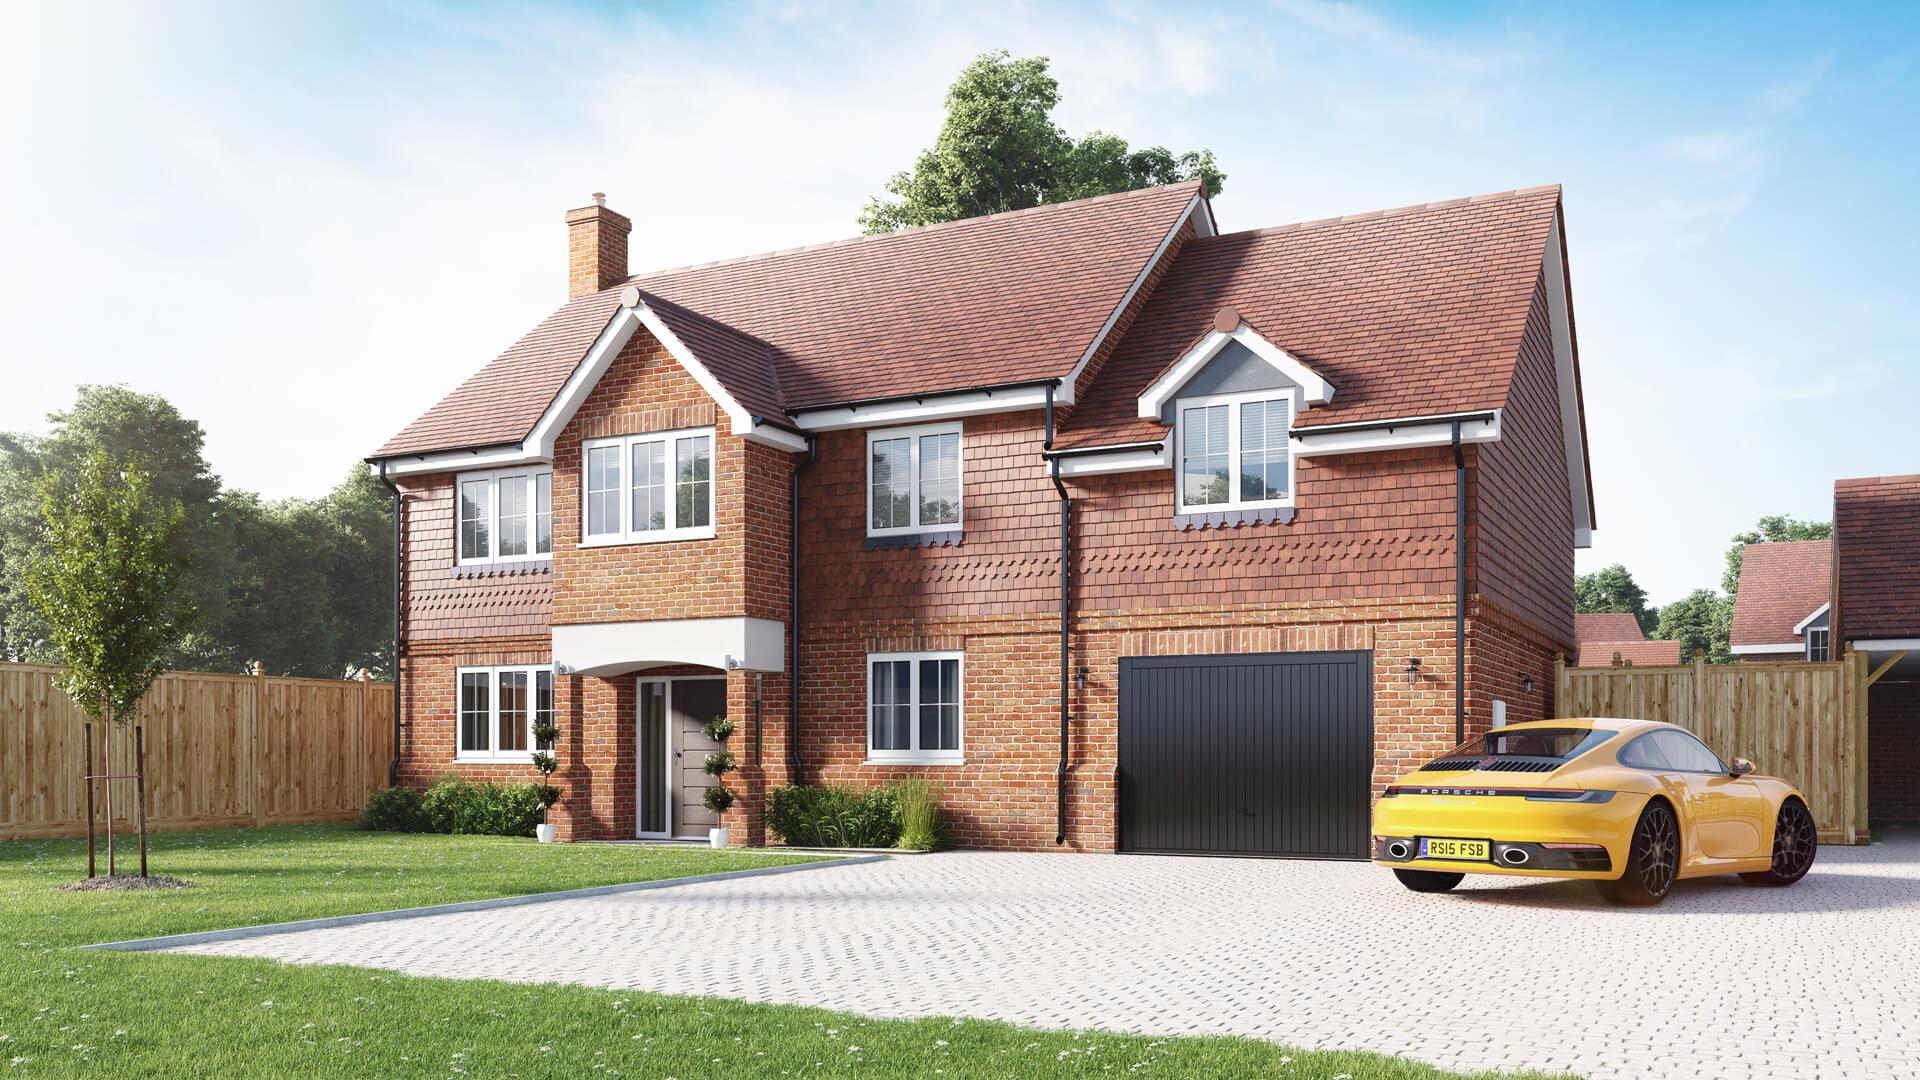 CGI of a Clarendon Custom Build Home at Langton Gardenss